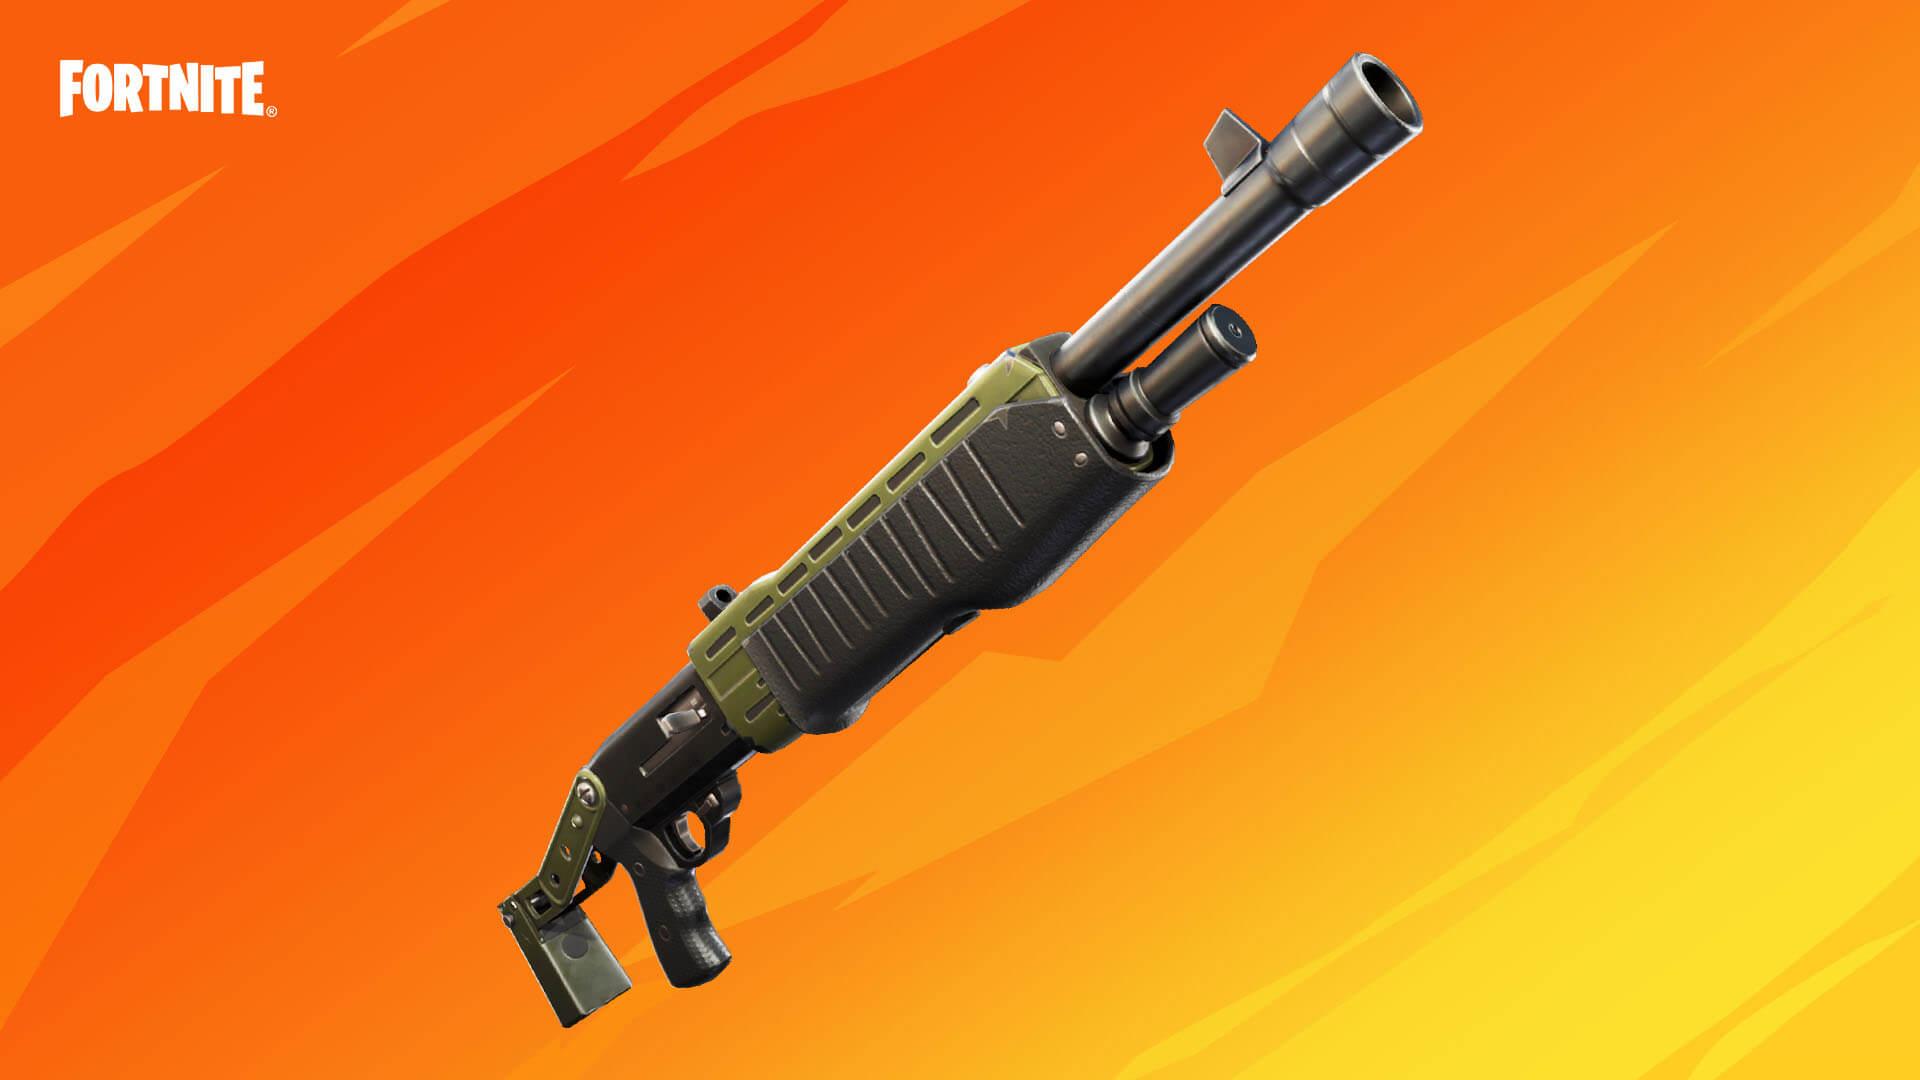 Fortnite Pumpgun